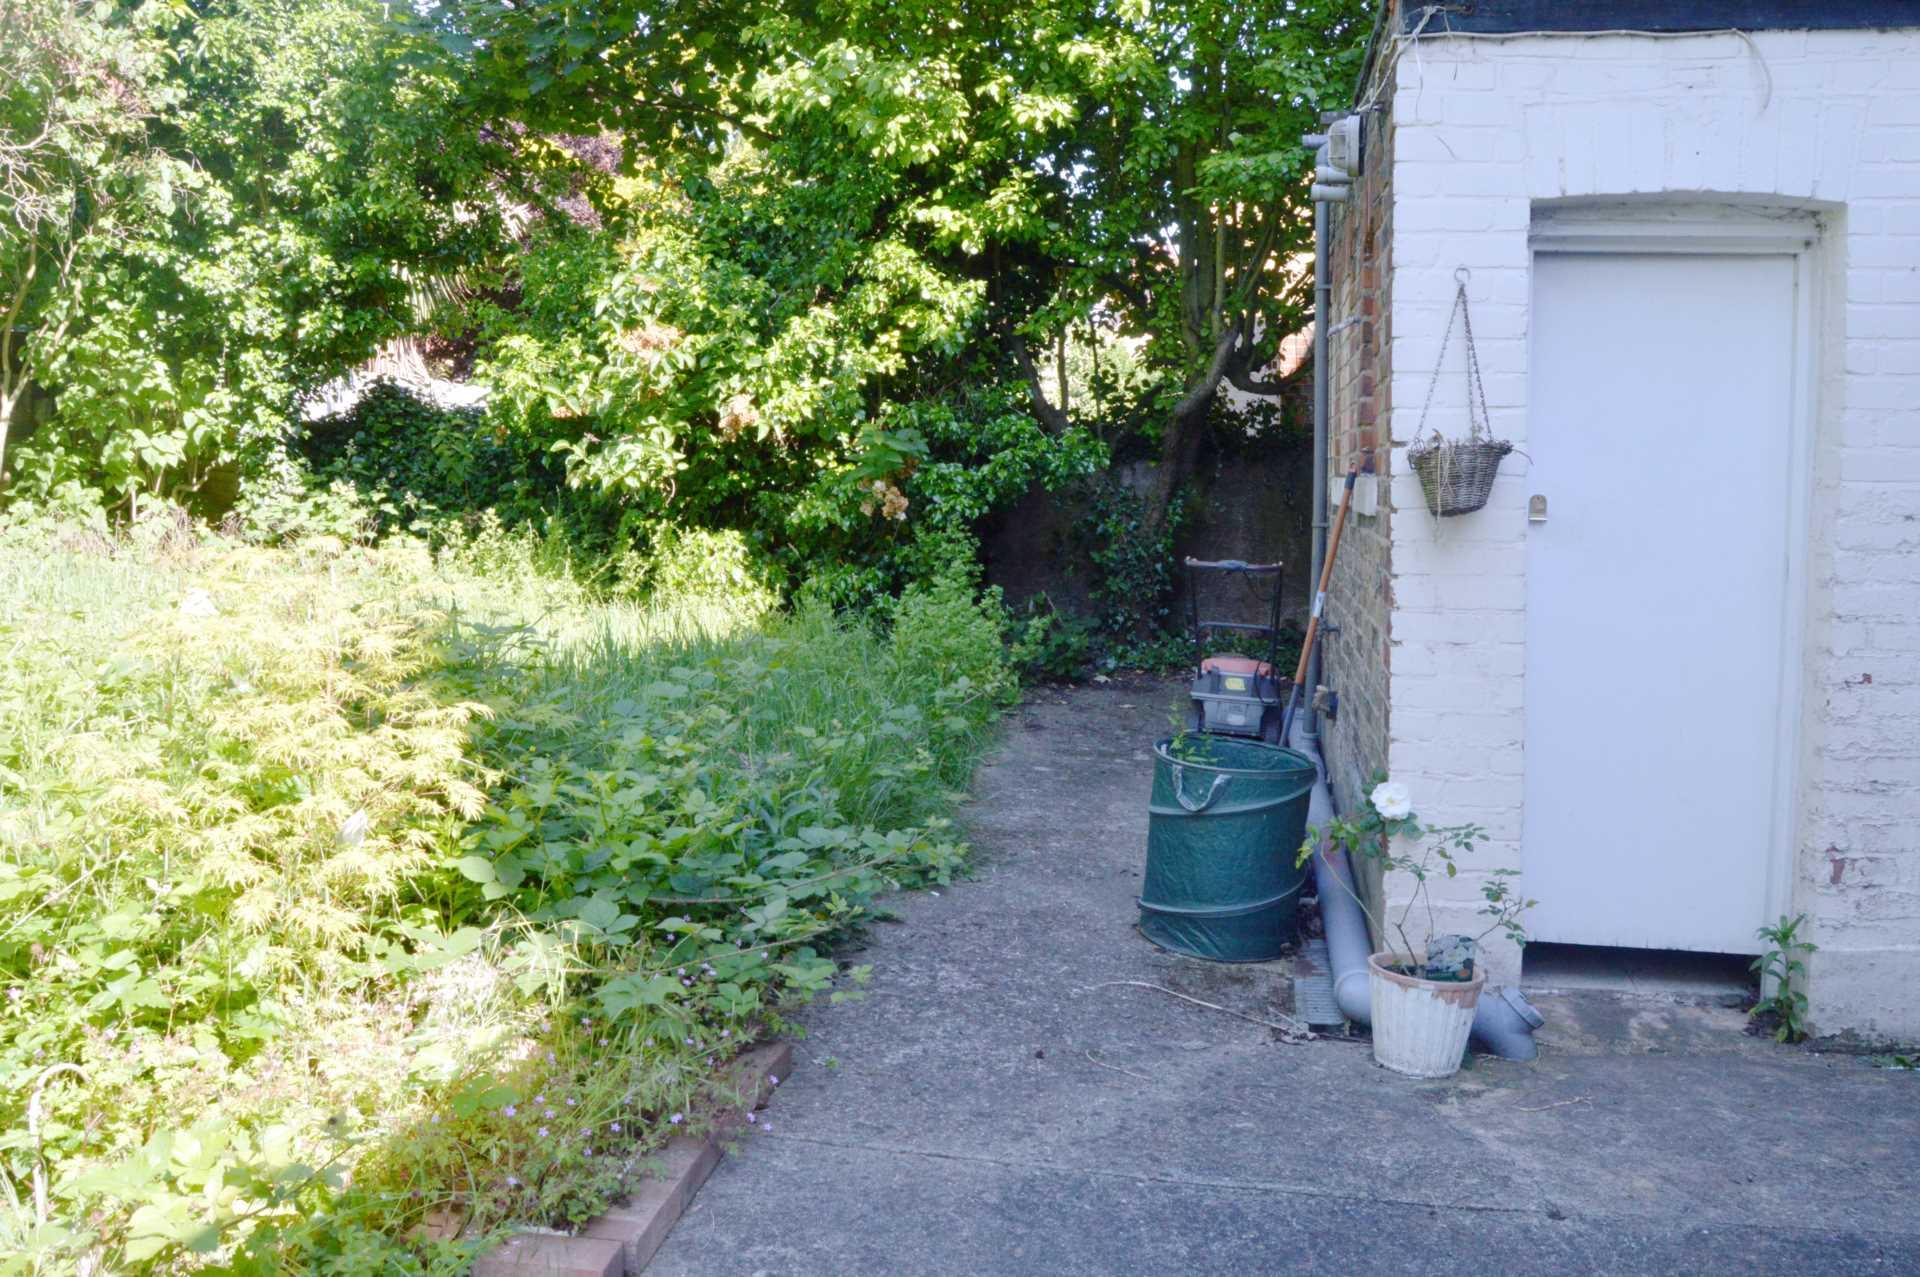 Emanuel Avenue, Acton, Image 7